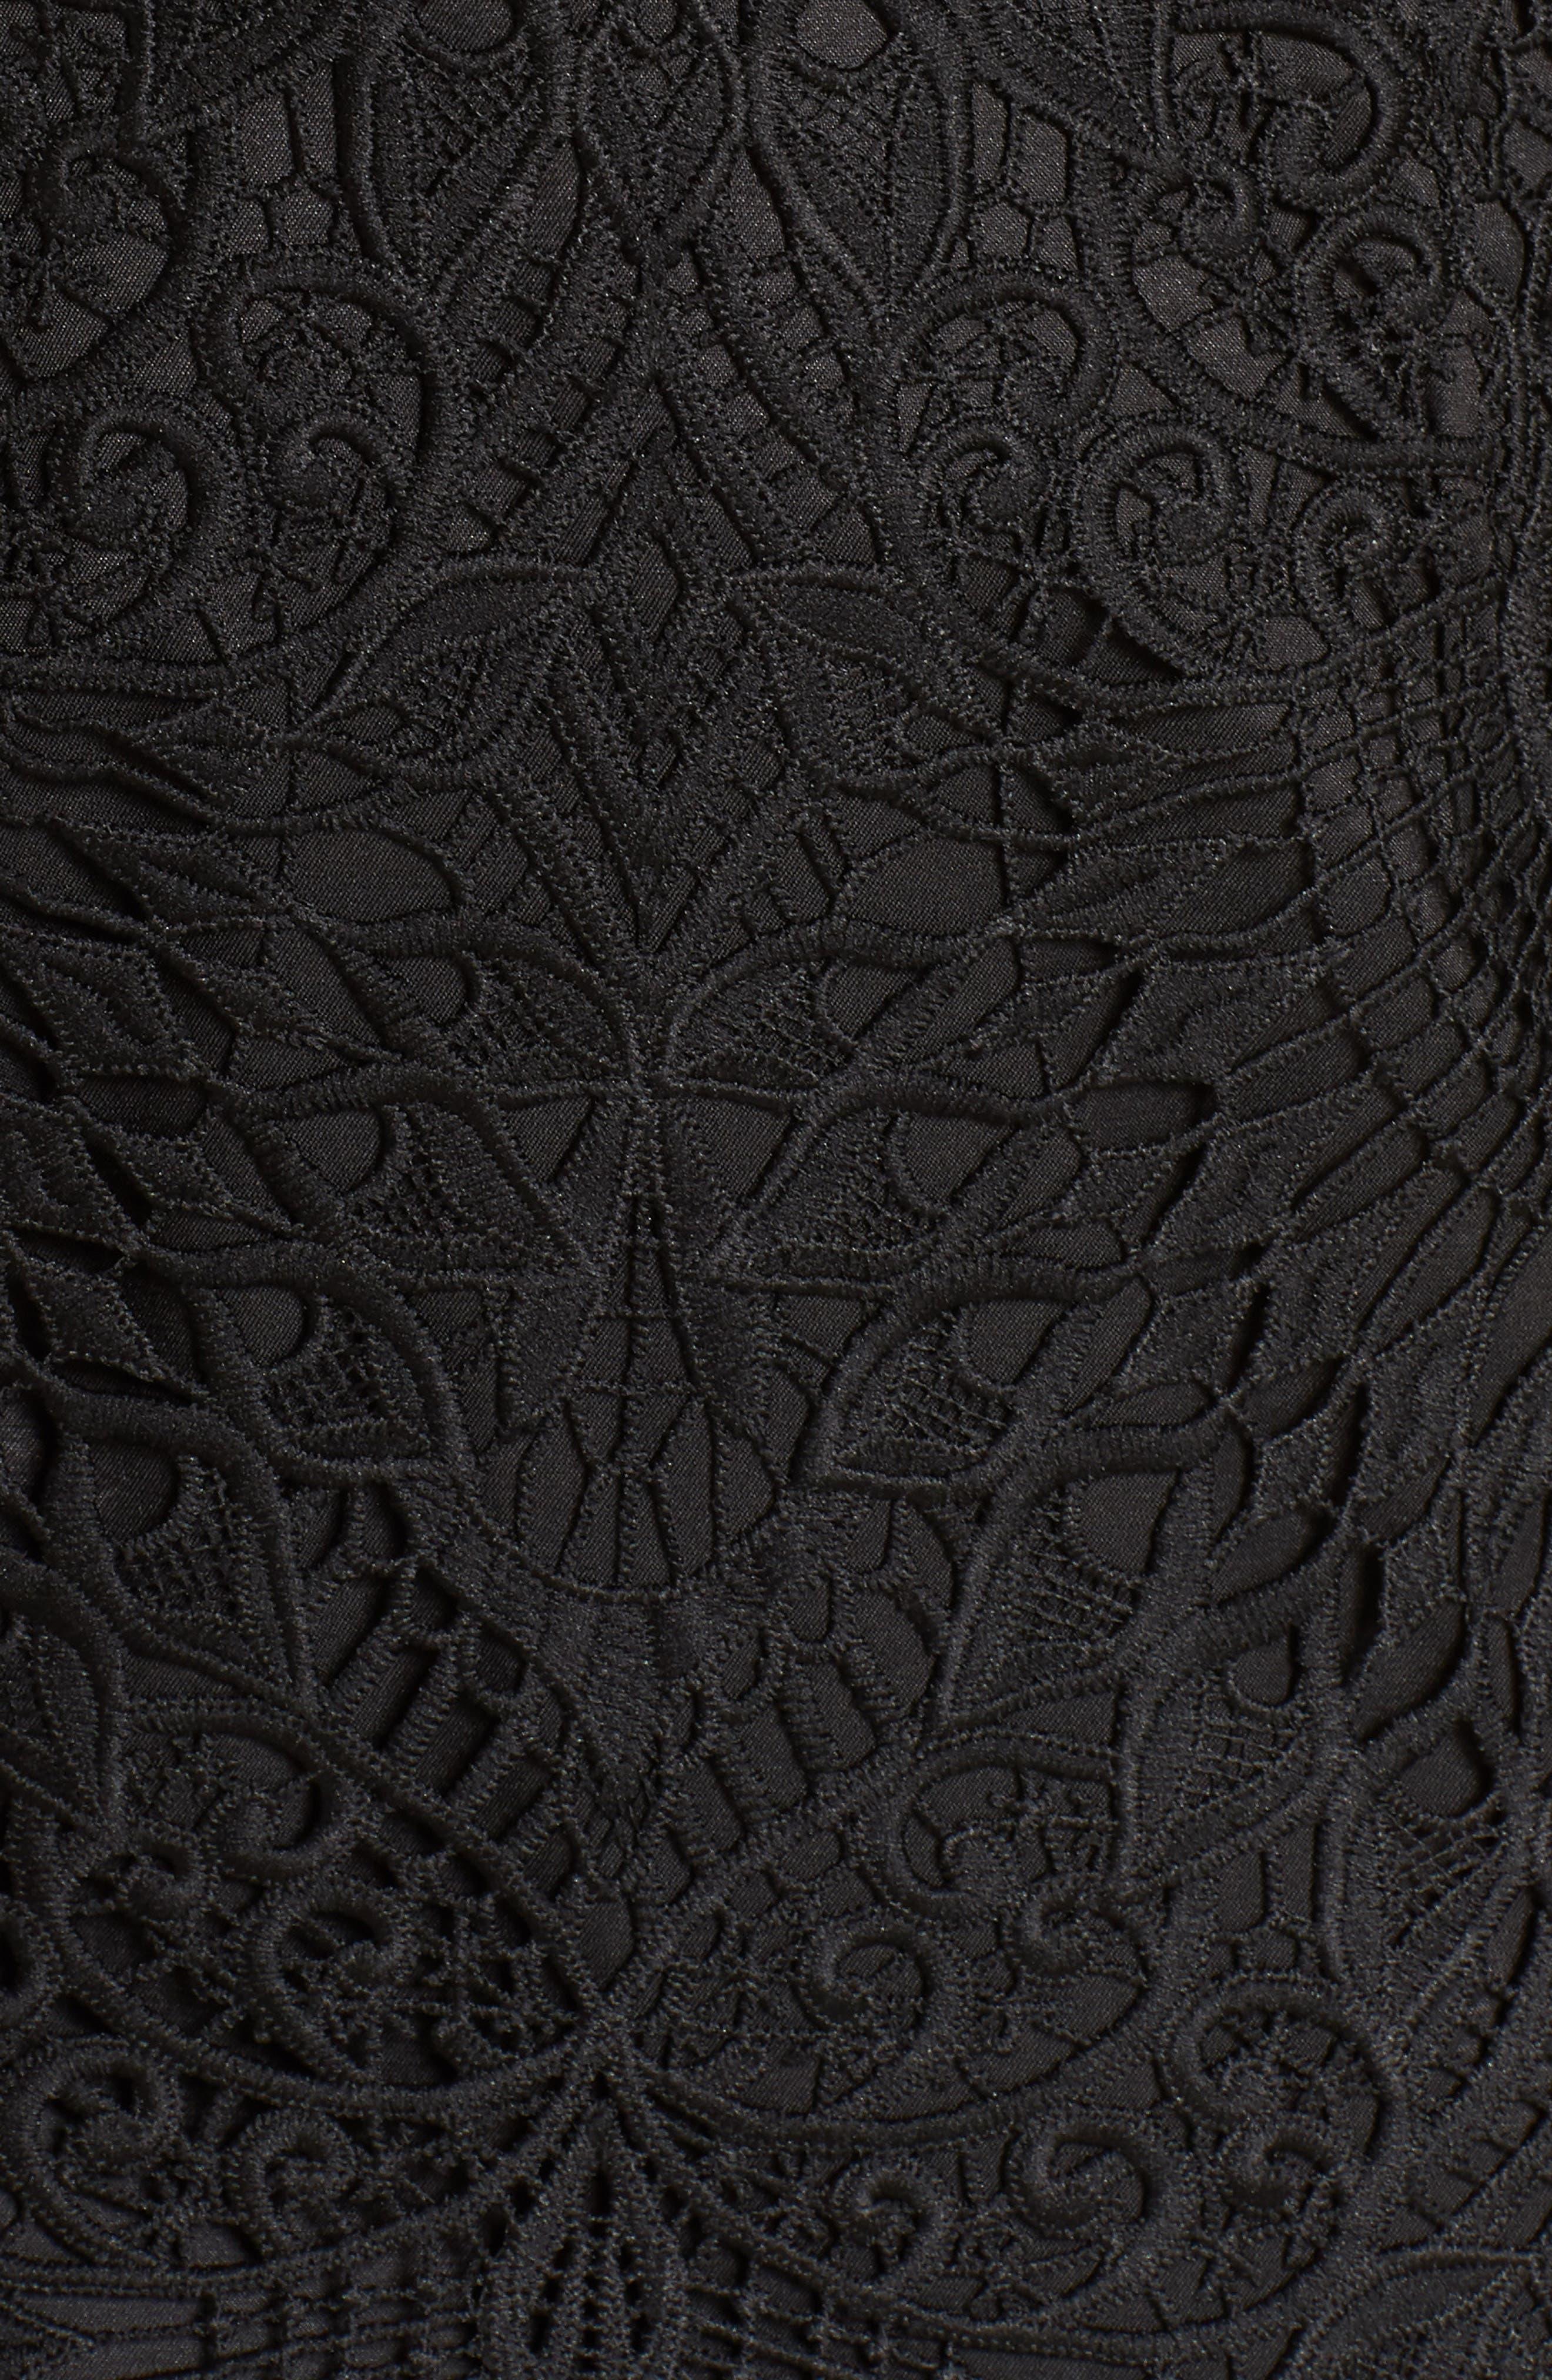 Calypso Lace Sheath Dress,                             Alternate thumbnail 6, color,                             BLACK/ NUDE